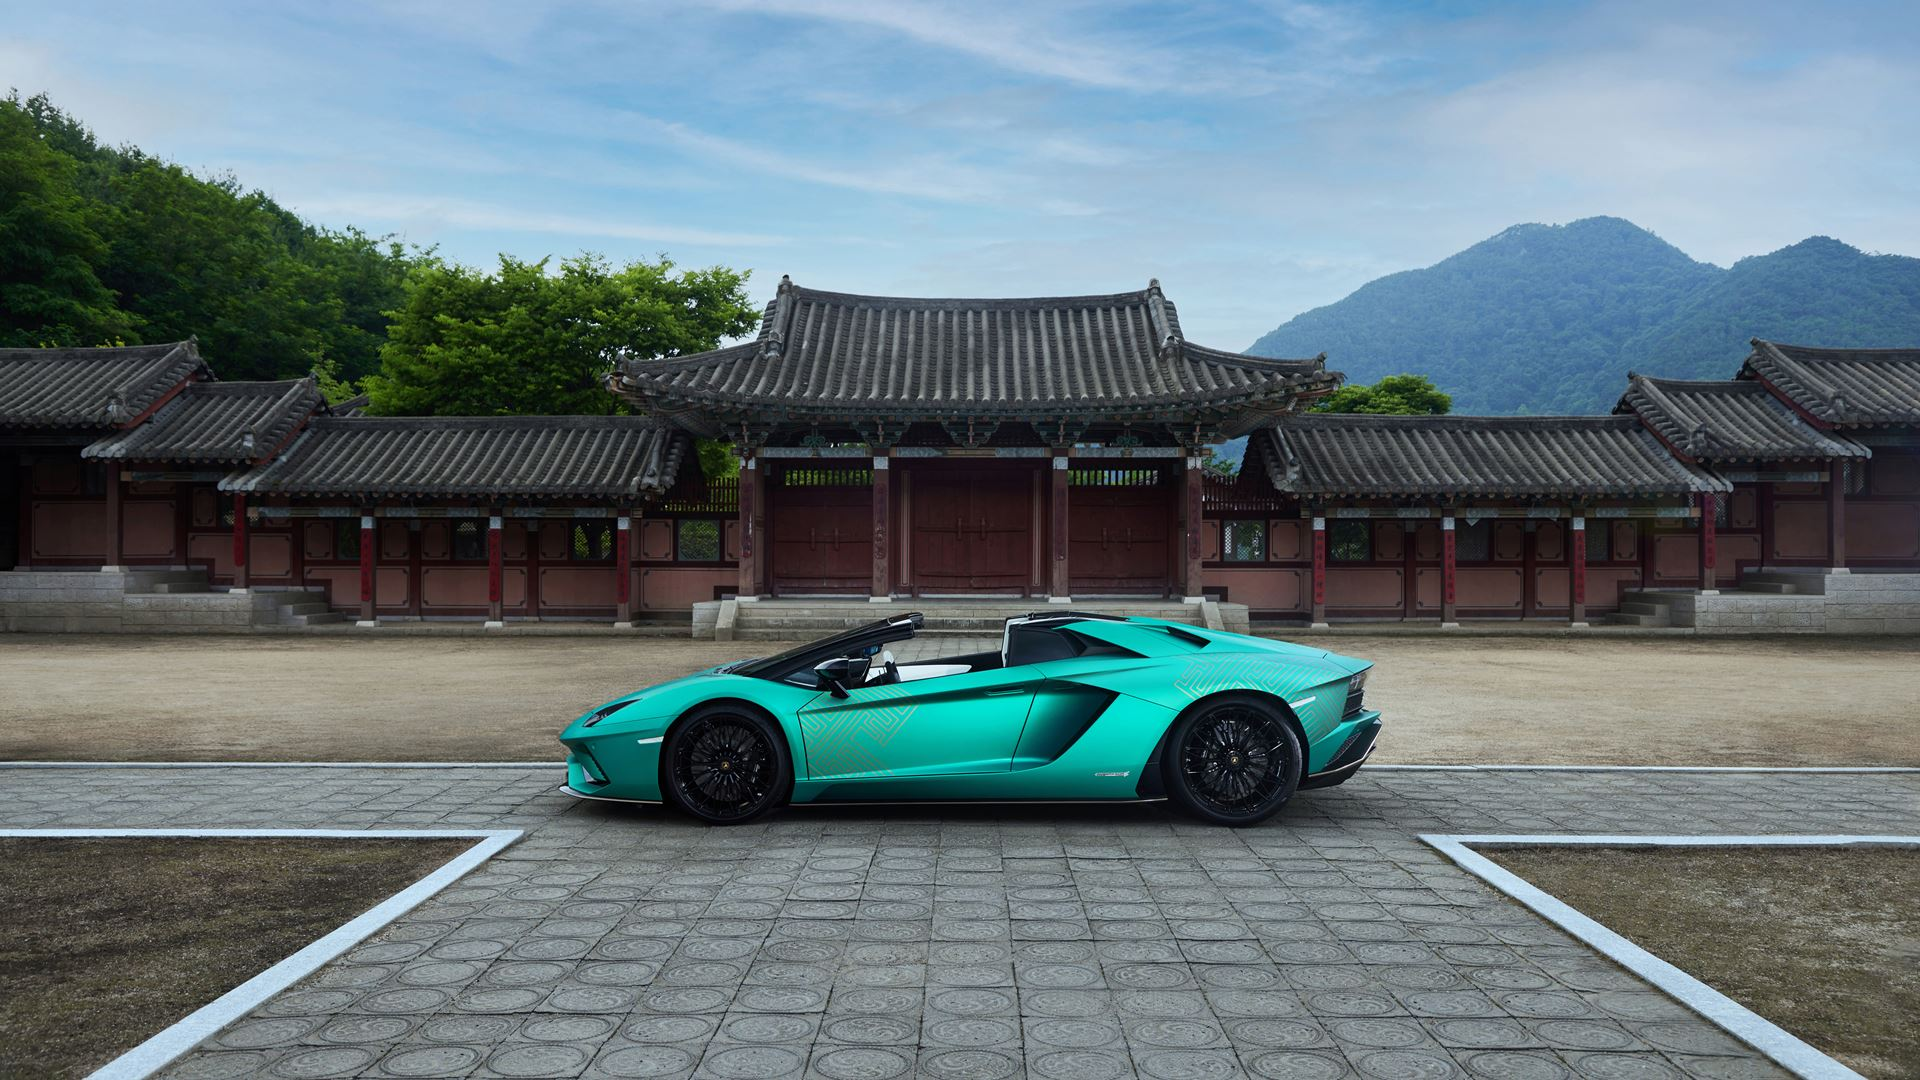 Lamborghini Seoul Unveils the Aventador S Roadster Korean Special Series - Image 6